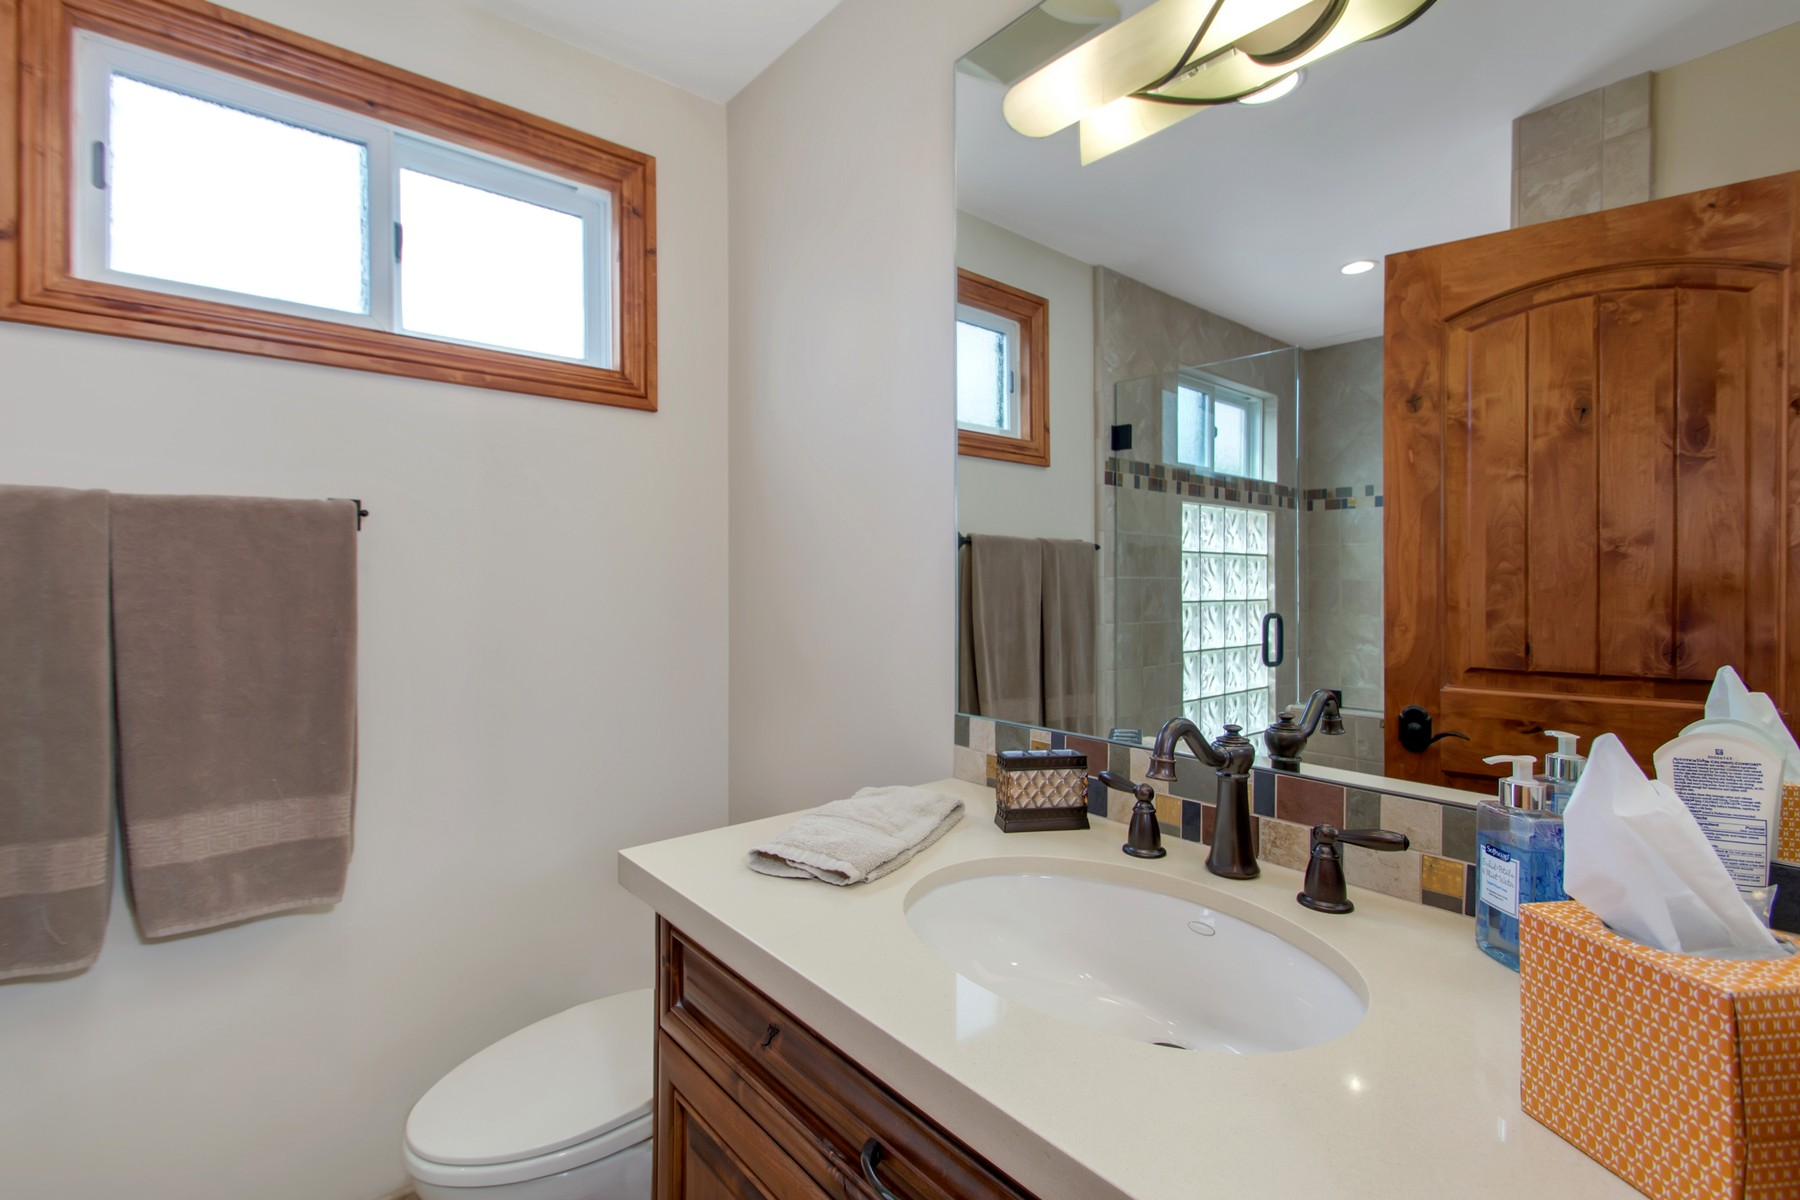 Additional photo for property listing at 2636 Ocean Front Walk  圣地亚哥, 加利福尼亚州 92109 美国